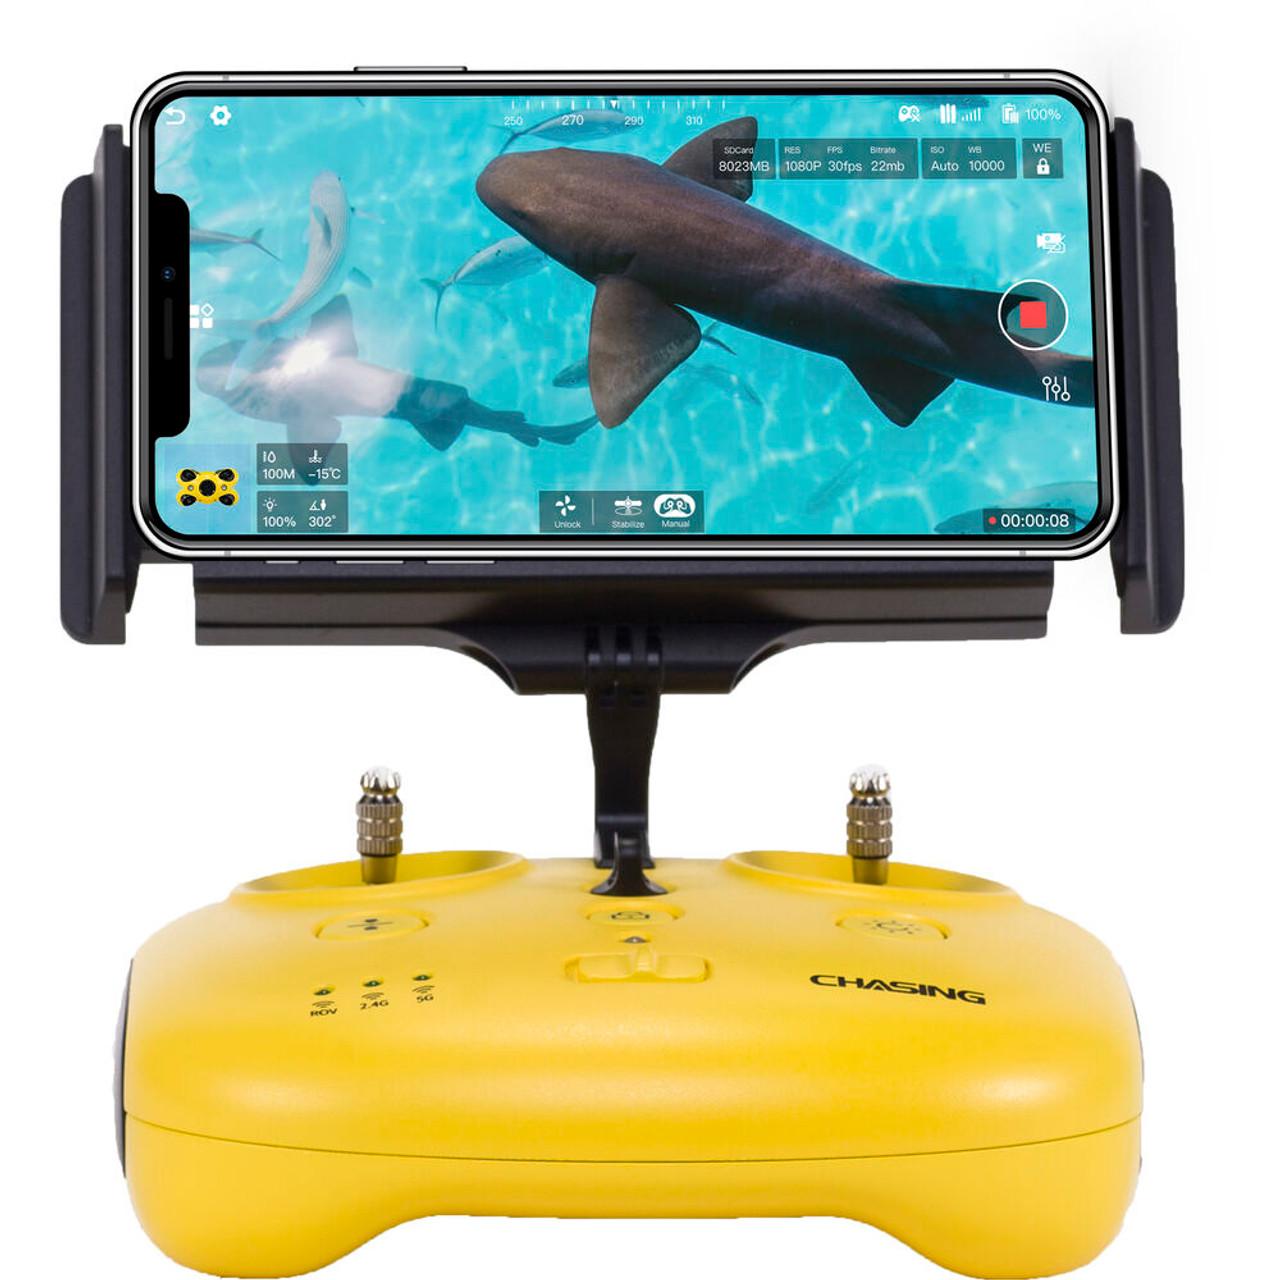 Chasing M2 Underwater ROV (200m Tether)